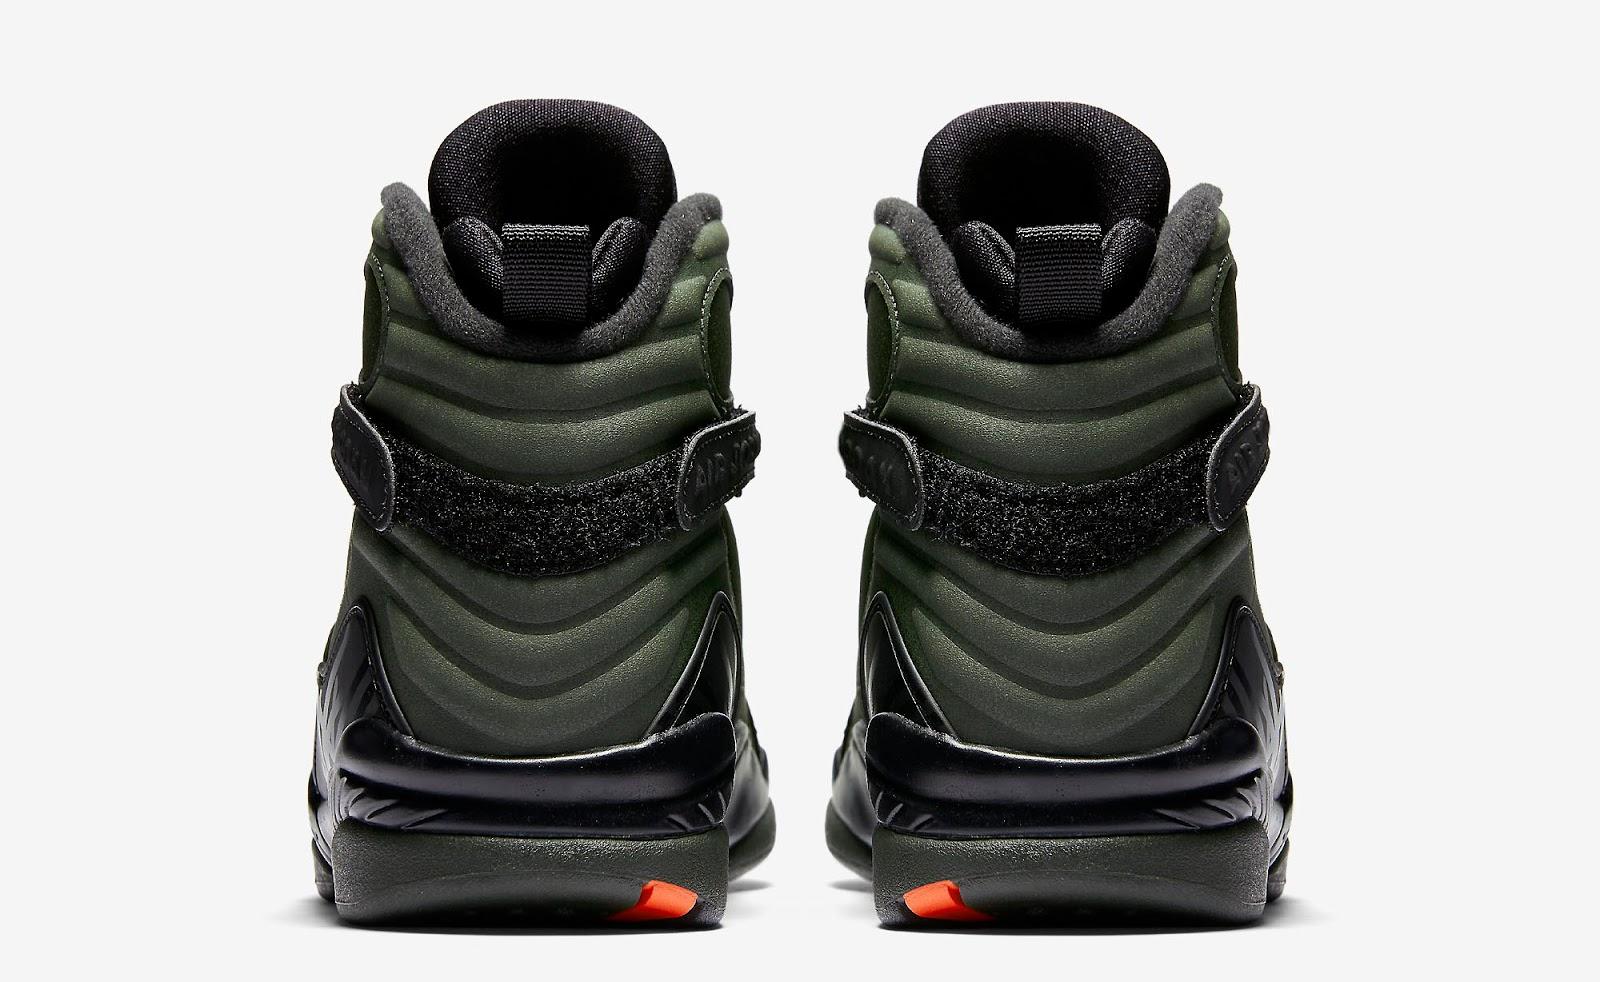 e8c59cde3b7 ajordanxi Your #1 Source For Sneaker Release Dates: Air Jordan 8 ...